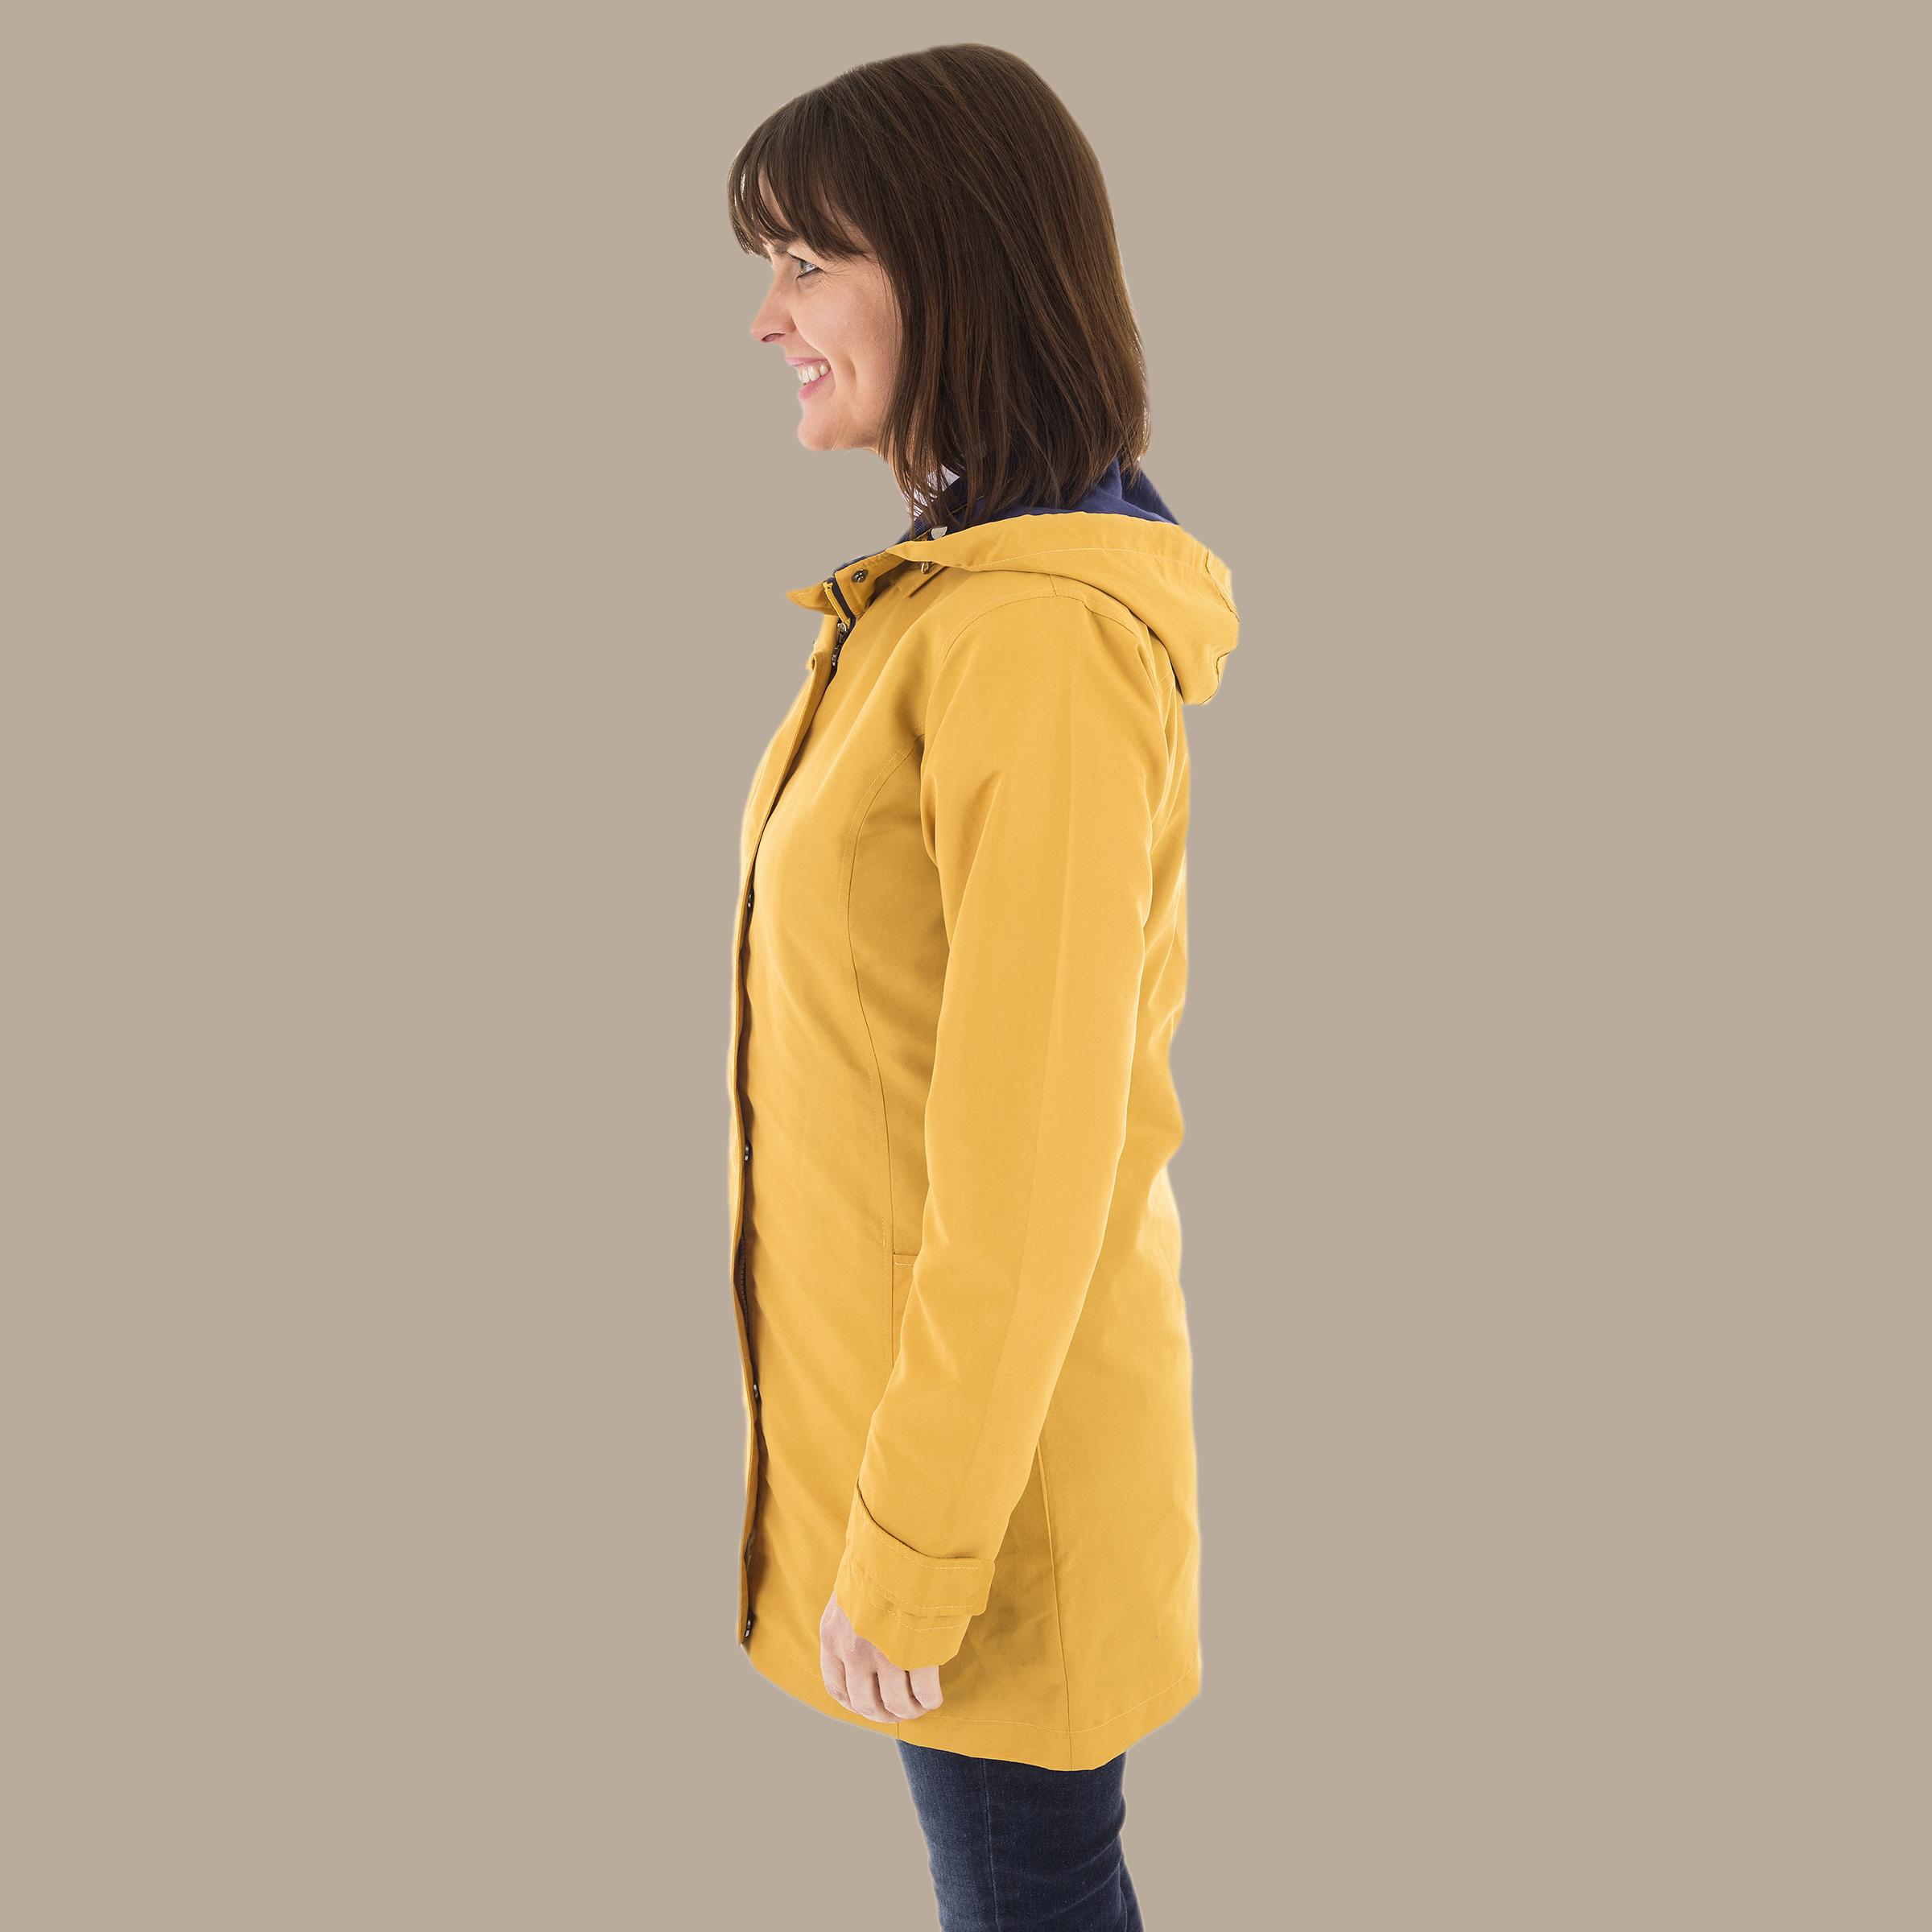 Rain Jacket_Side